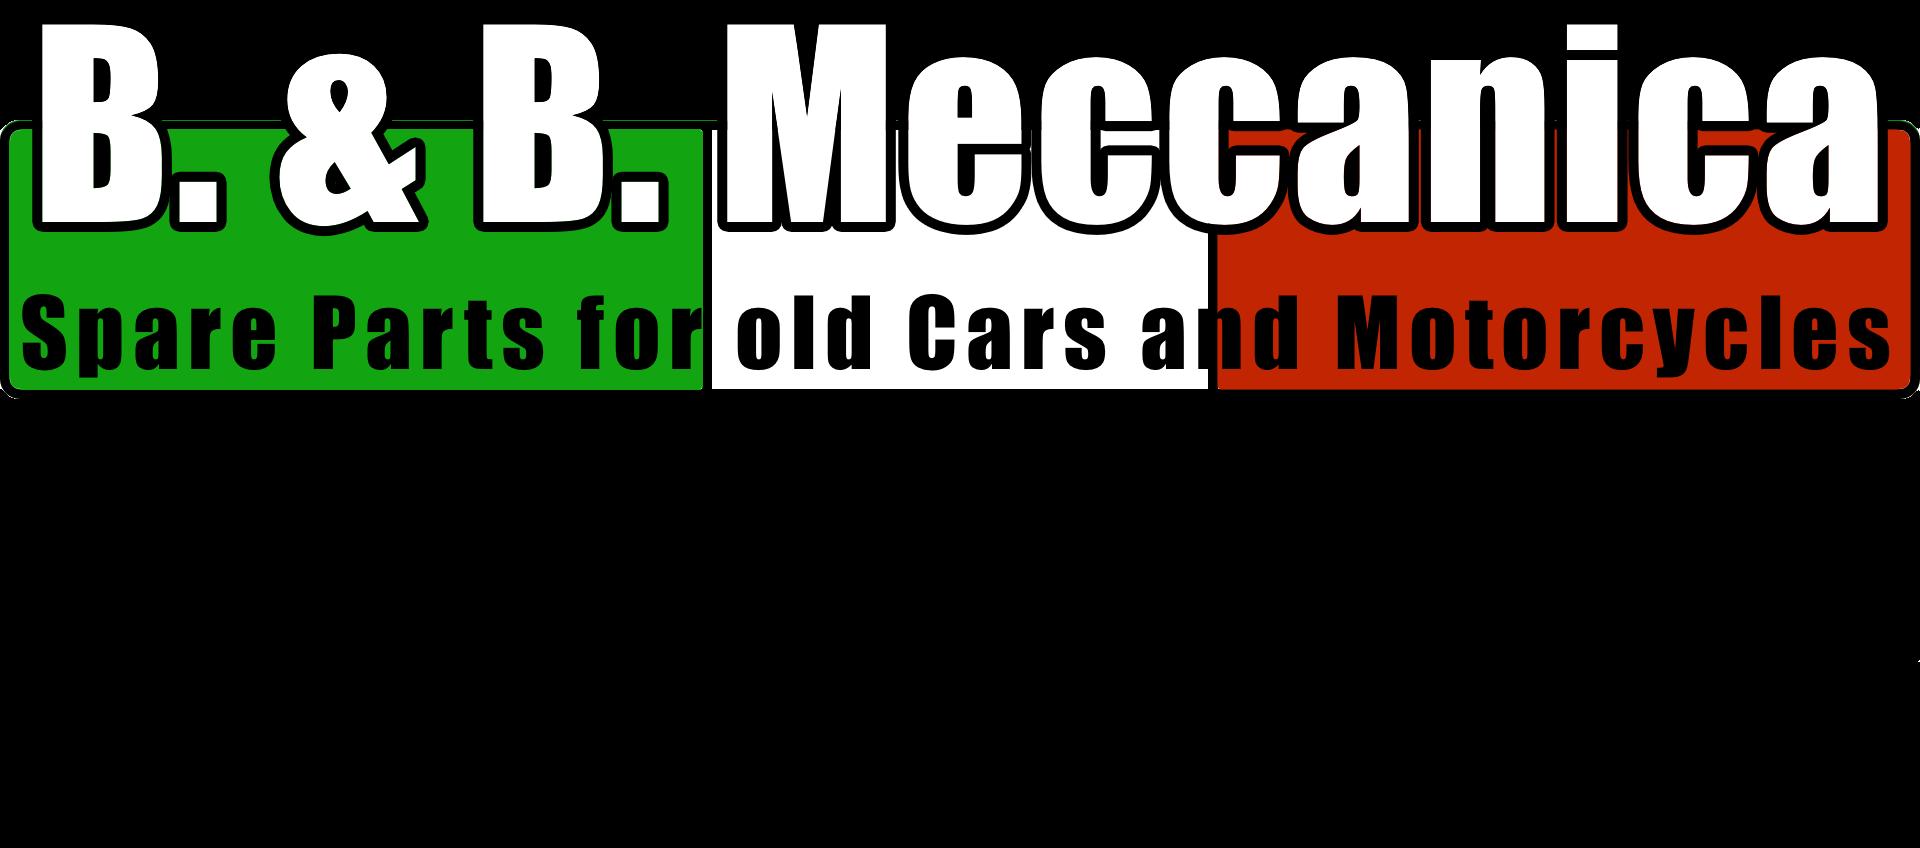 B&B Meccanica